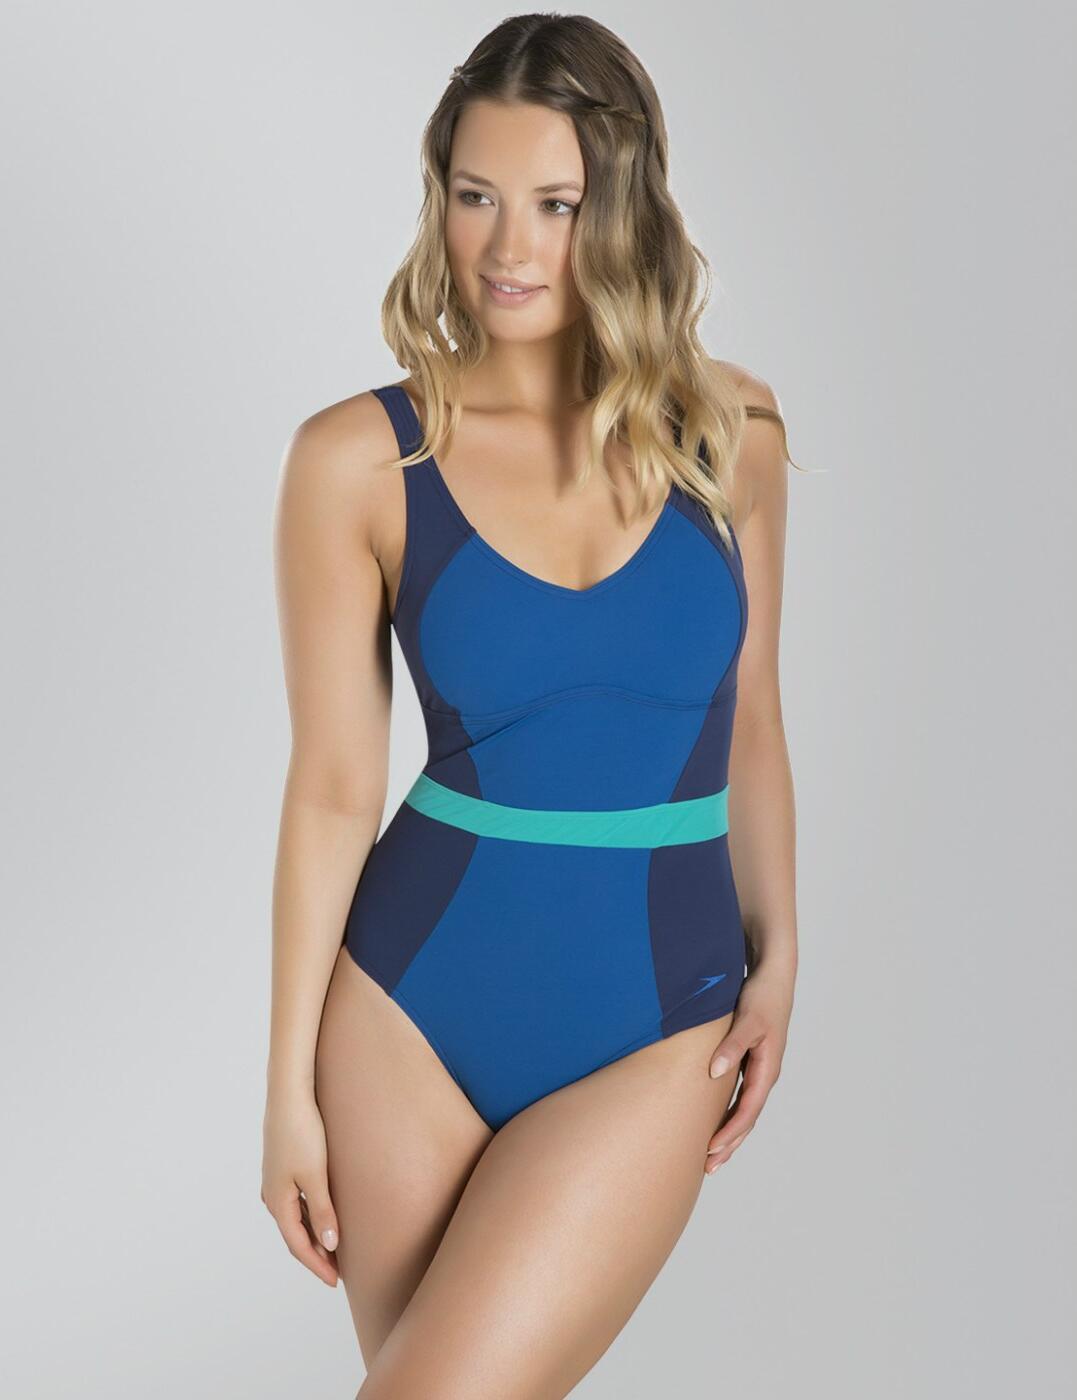 7f27003d19e42 Speedo Sculpture CrystalGleam Swimsuit Swimming Costume 810832B368 ...